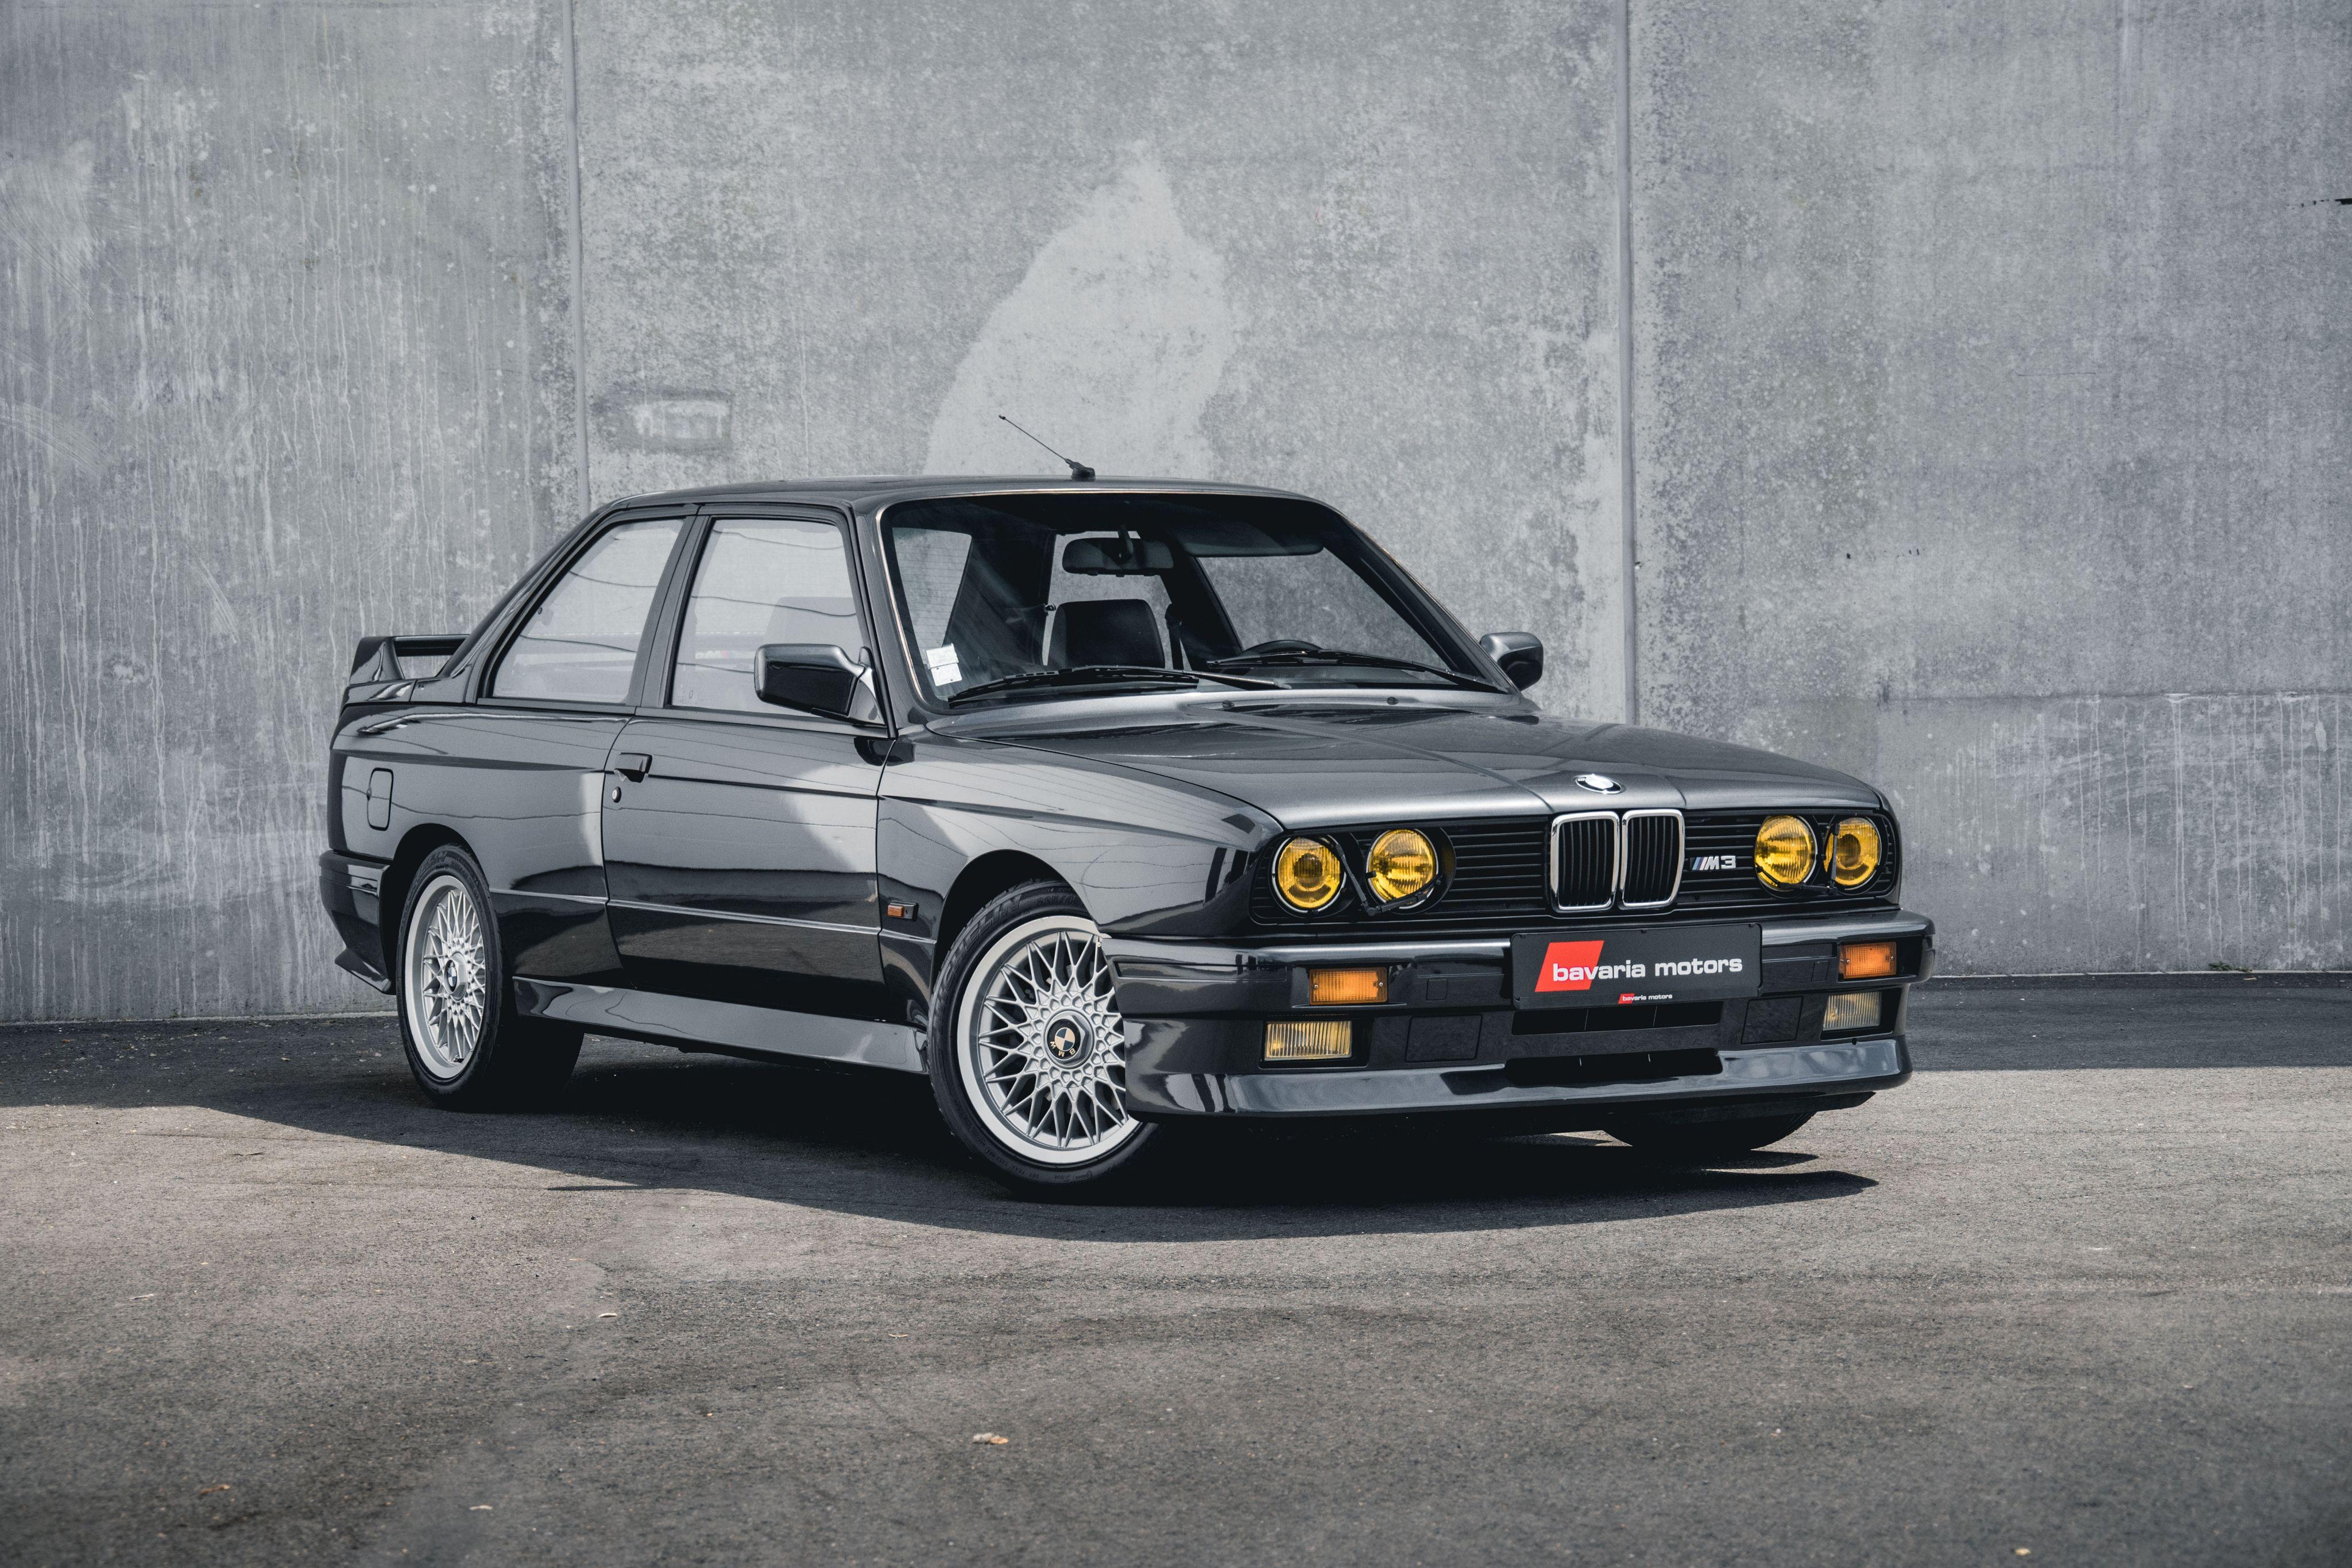 1986 90 E30 M3 Coupe Bmw M3 Coupe Bmw Bmw M3